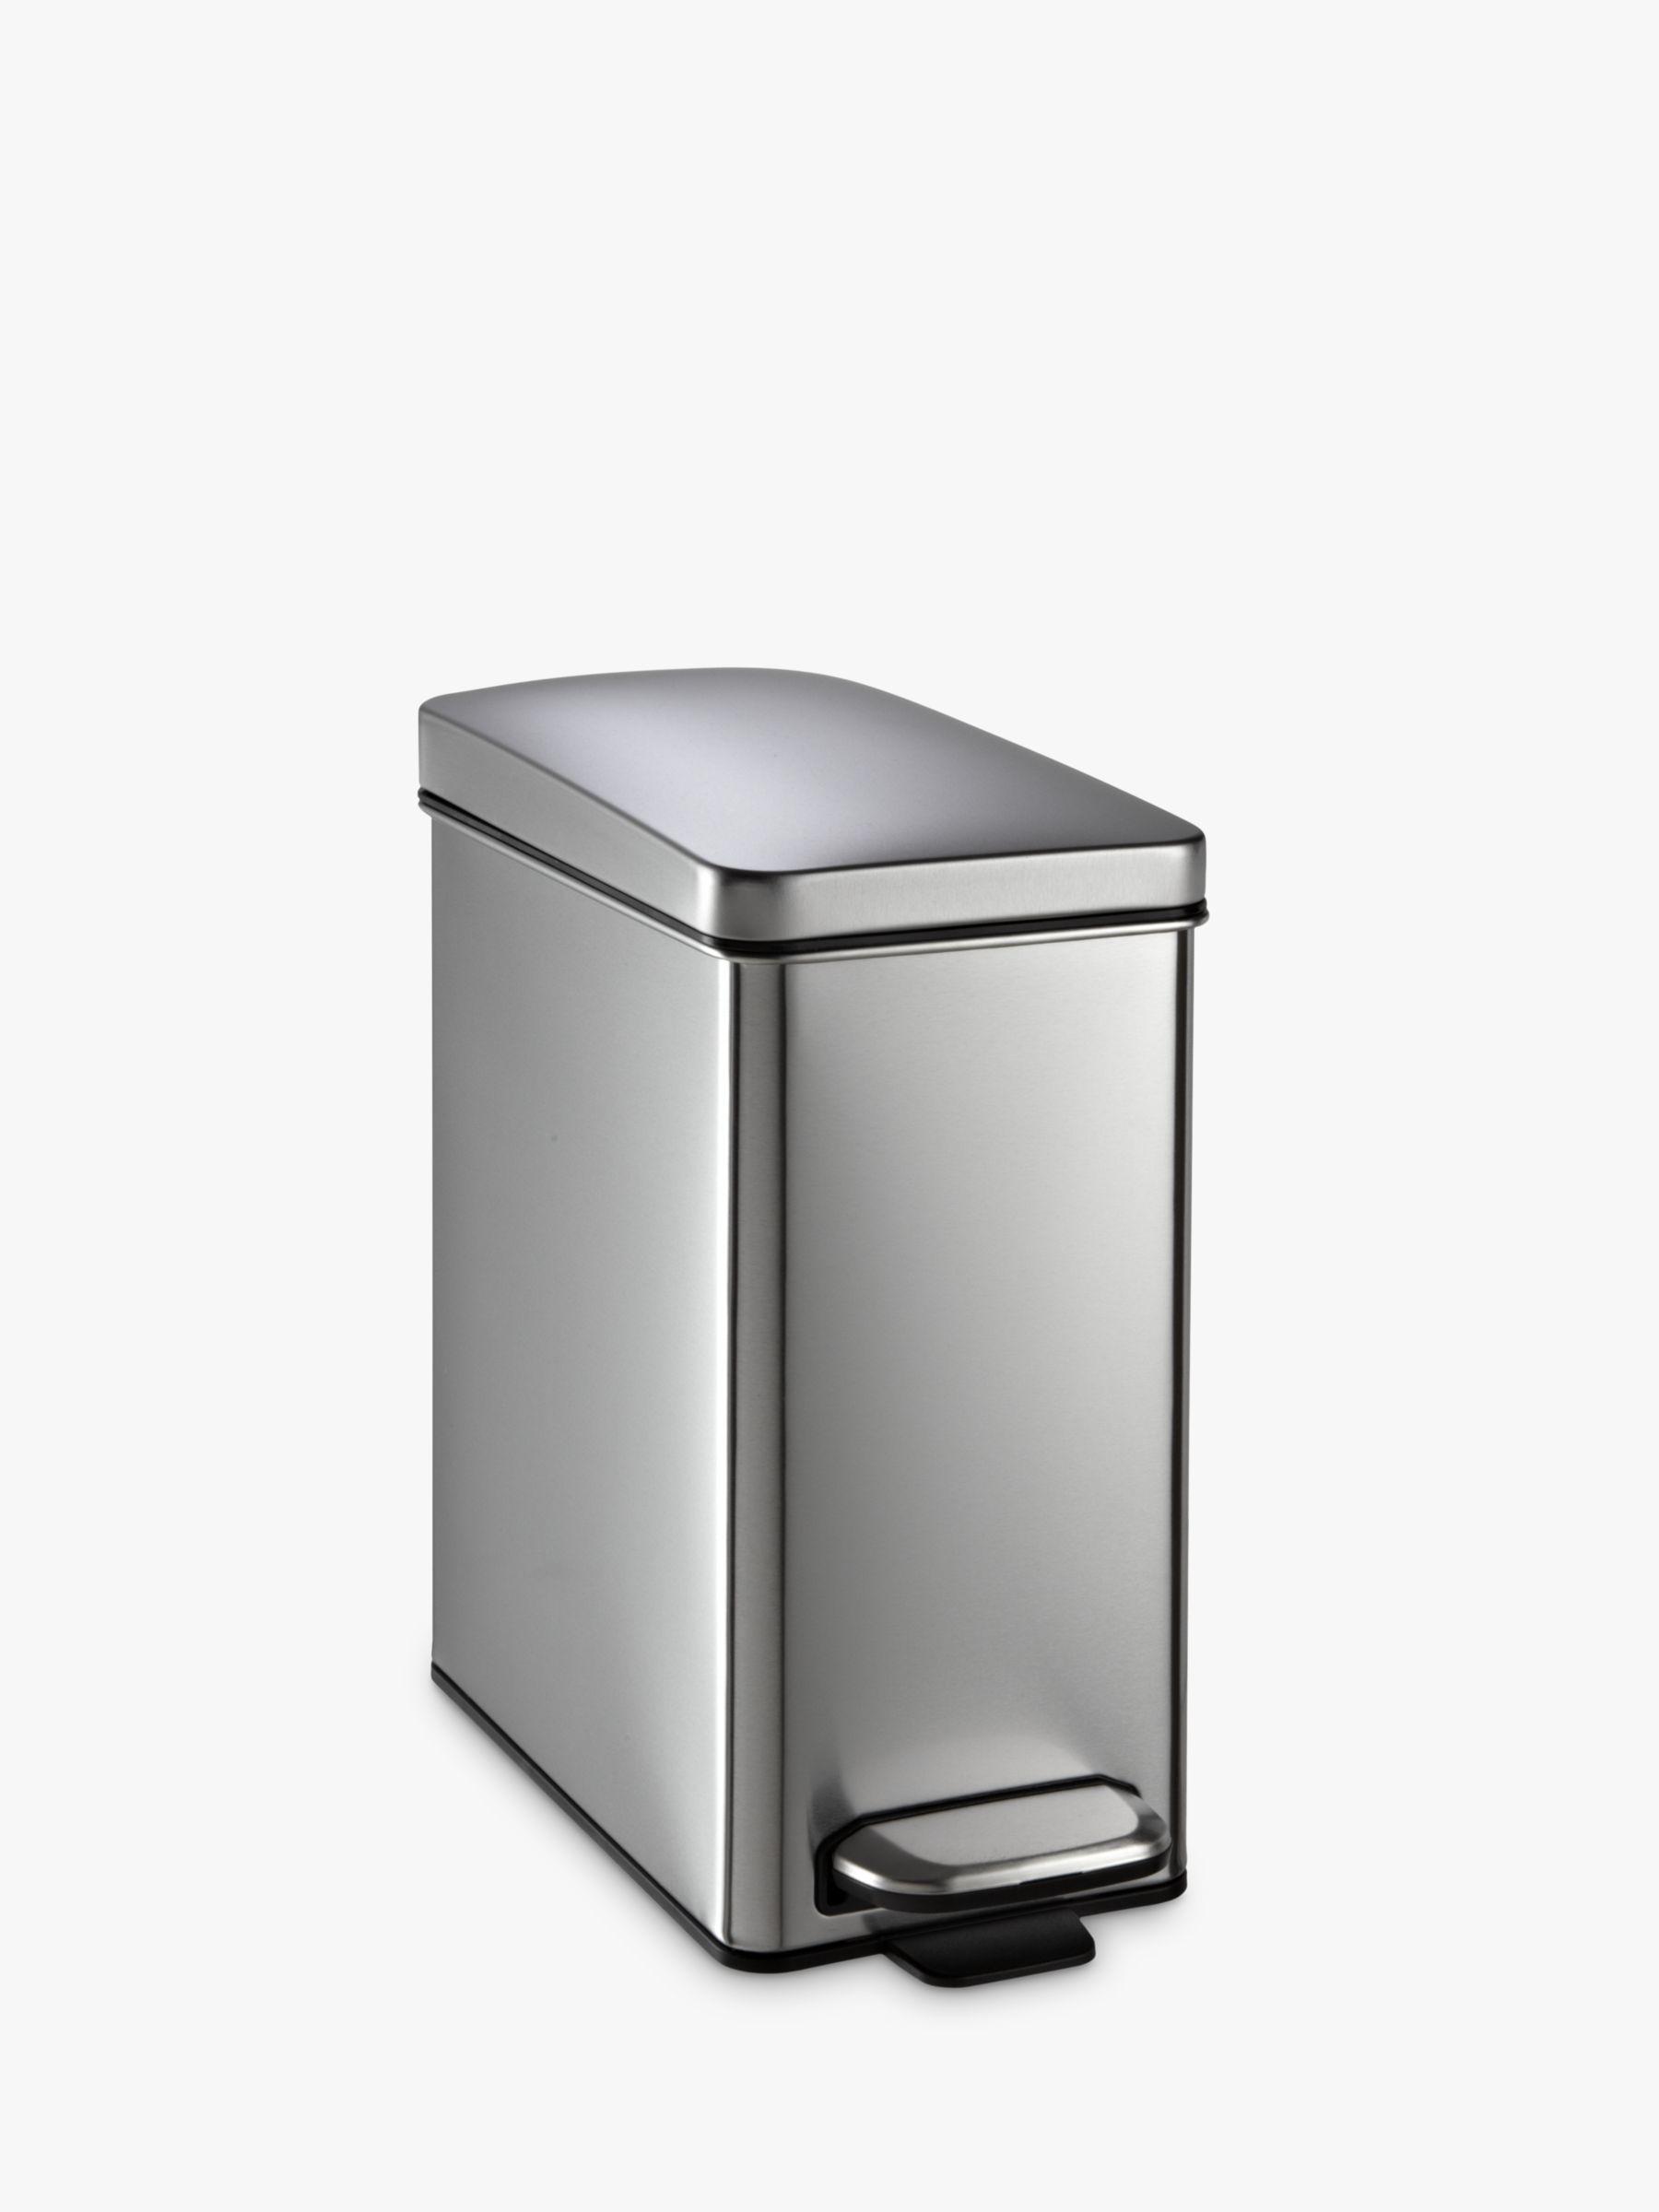 simplehuman pedal bin kitchen bin compare prices at foundem. Black Bedroom Furniture Sets. Home Design Ideas